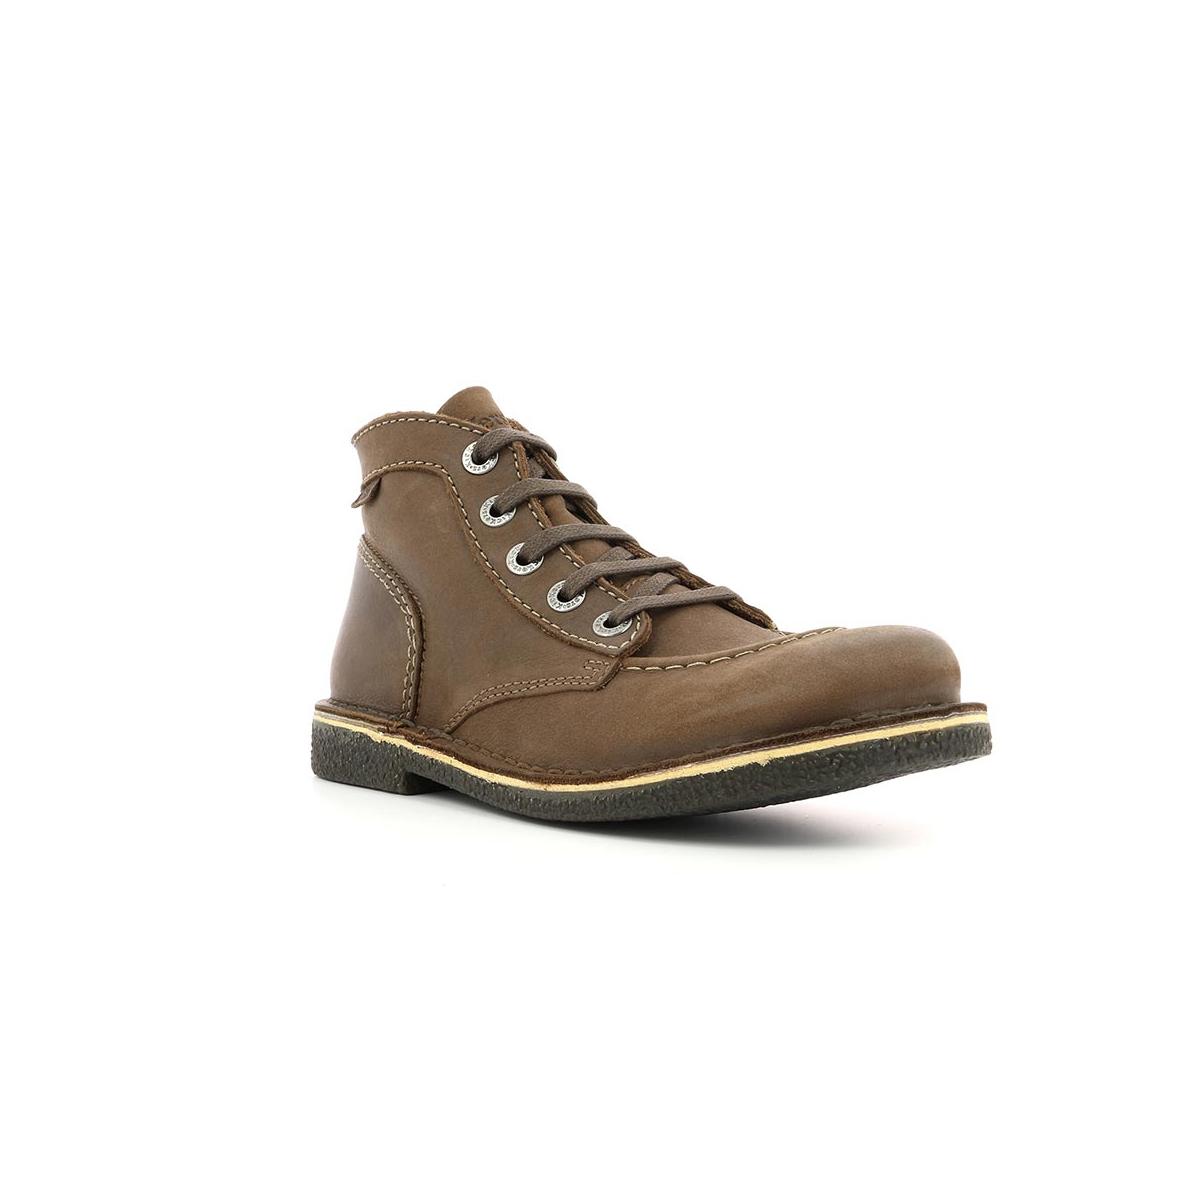 chaussures femme legendiknew marron fonce perm kickers. Black Bedroom Furniture Sets. Home Design Ideas